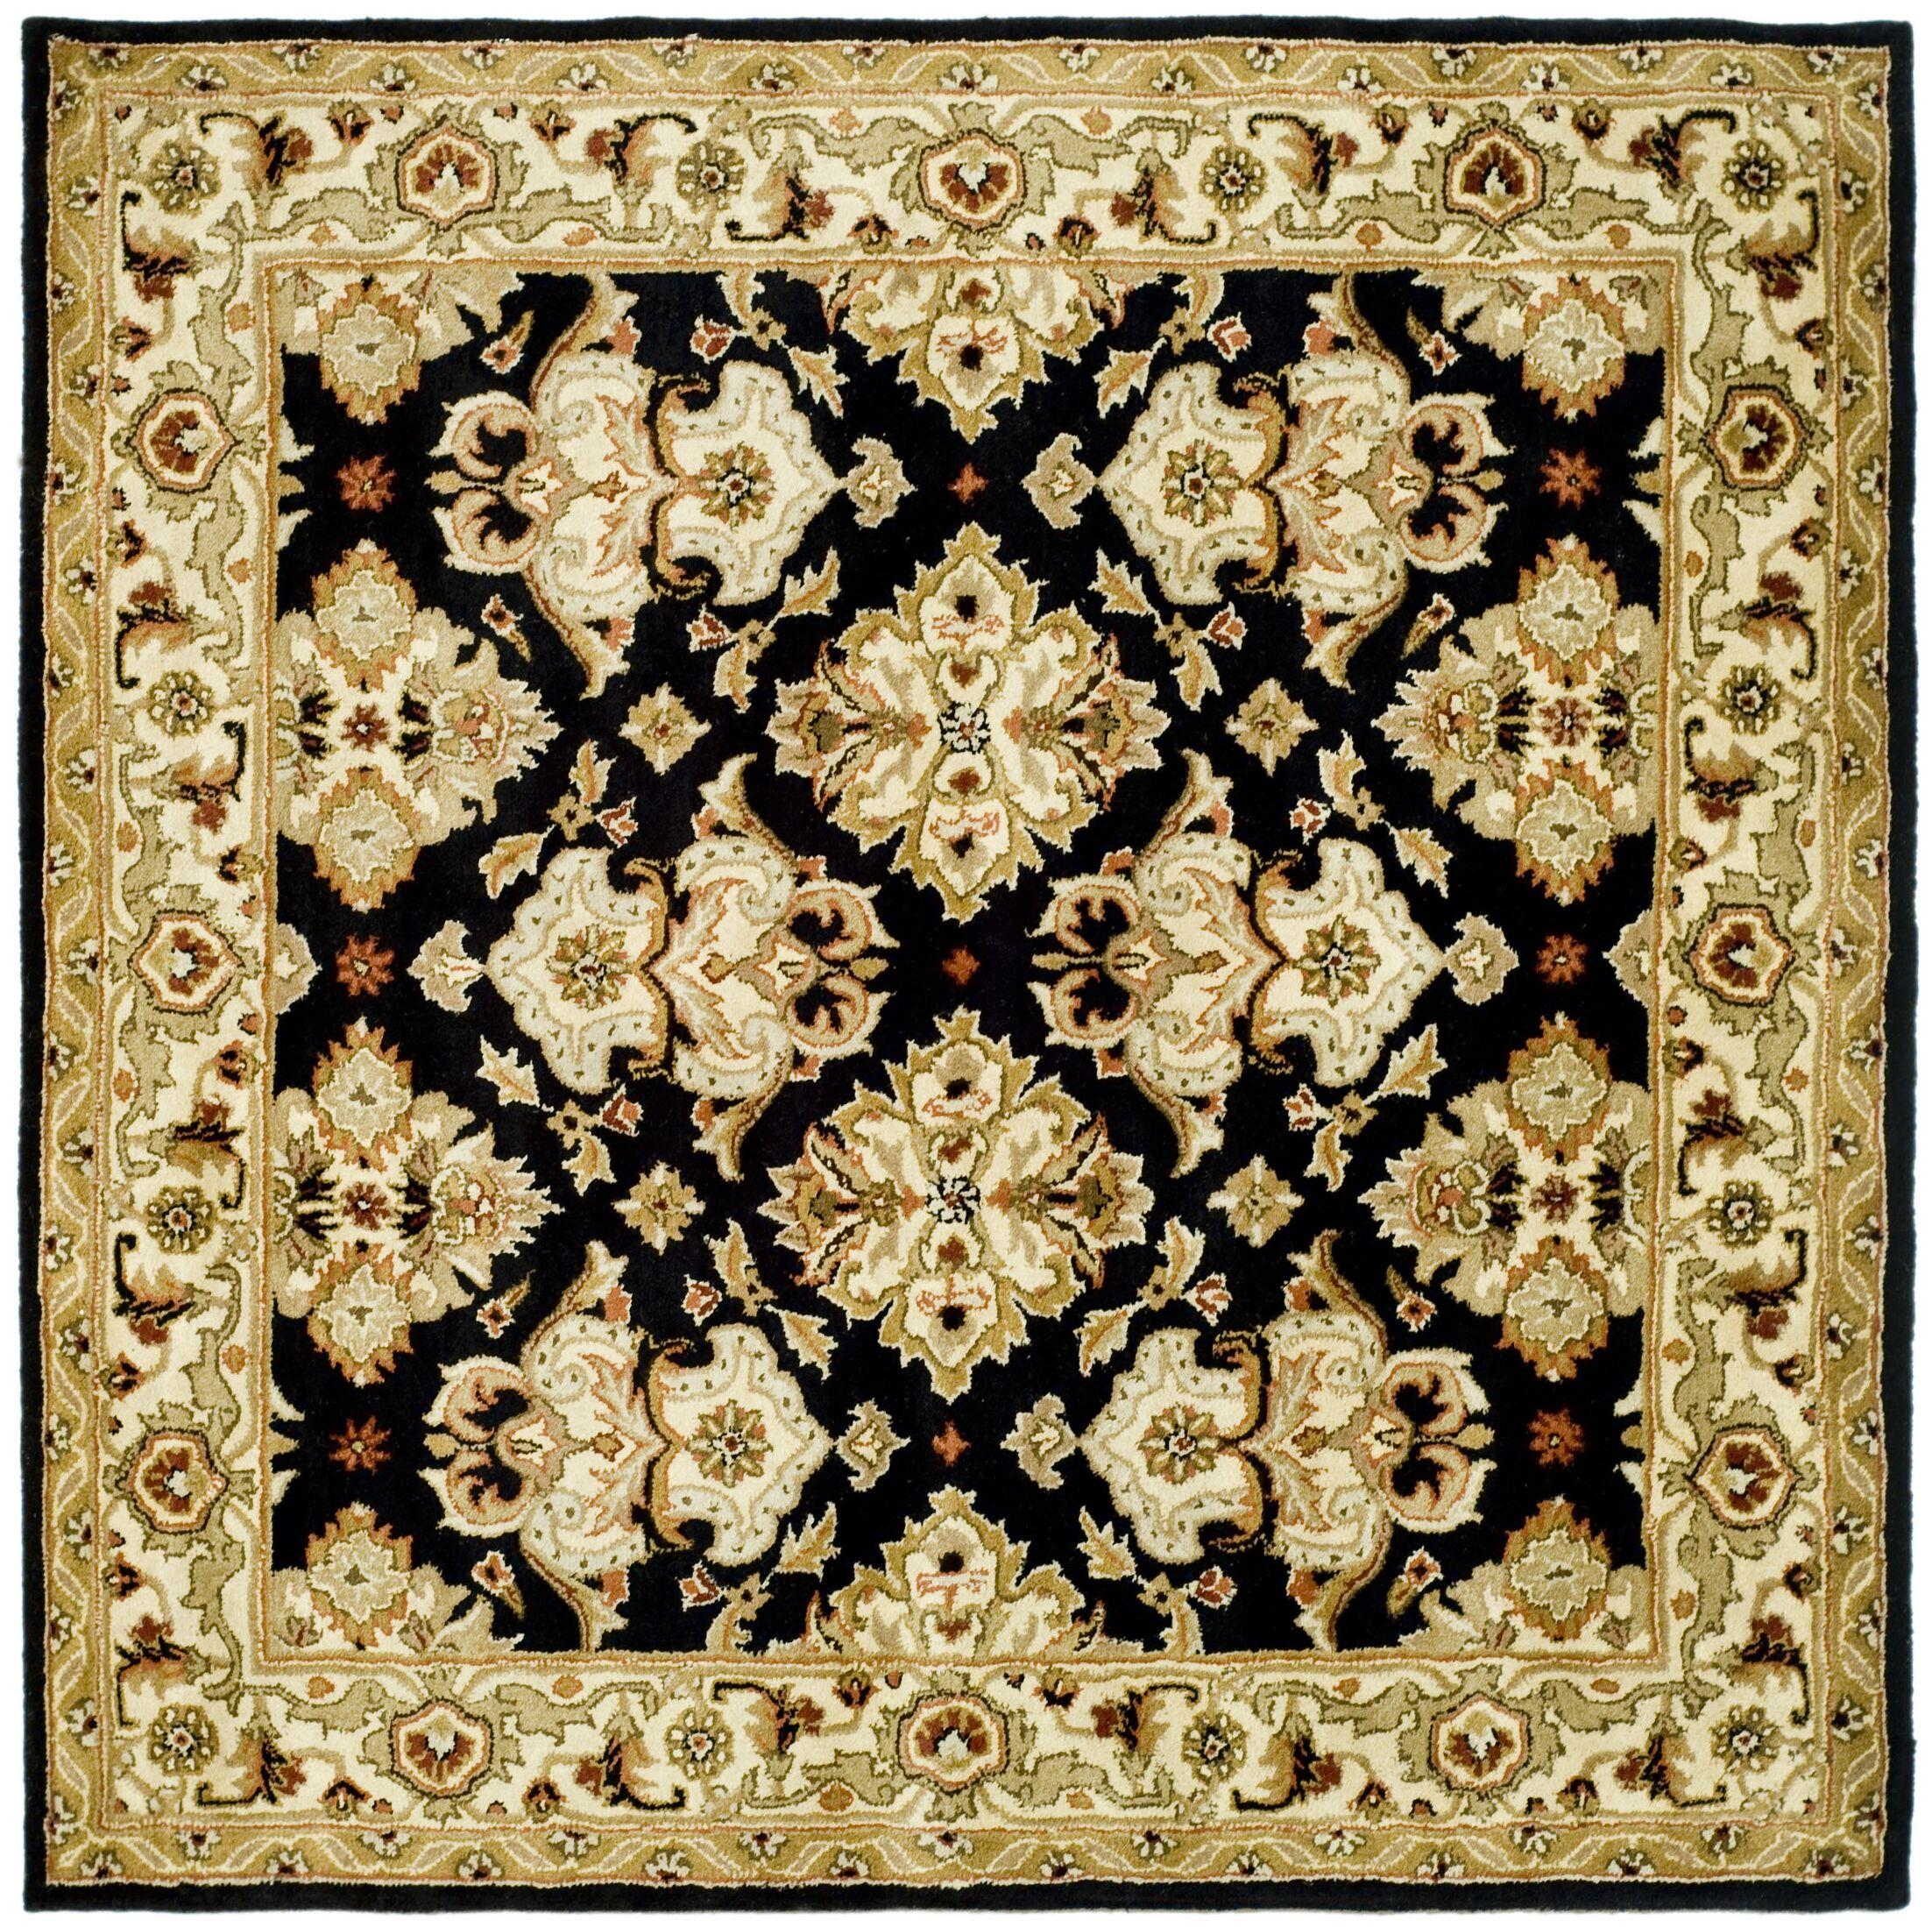 Balthrop Black/Ivory Area Rug Rug Size: Square 8'